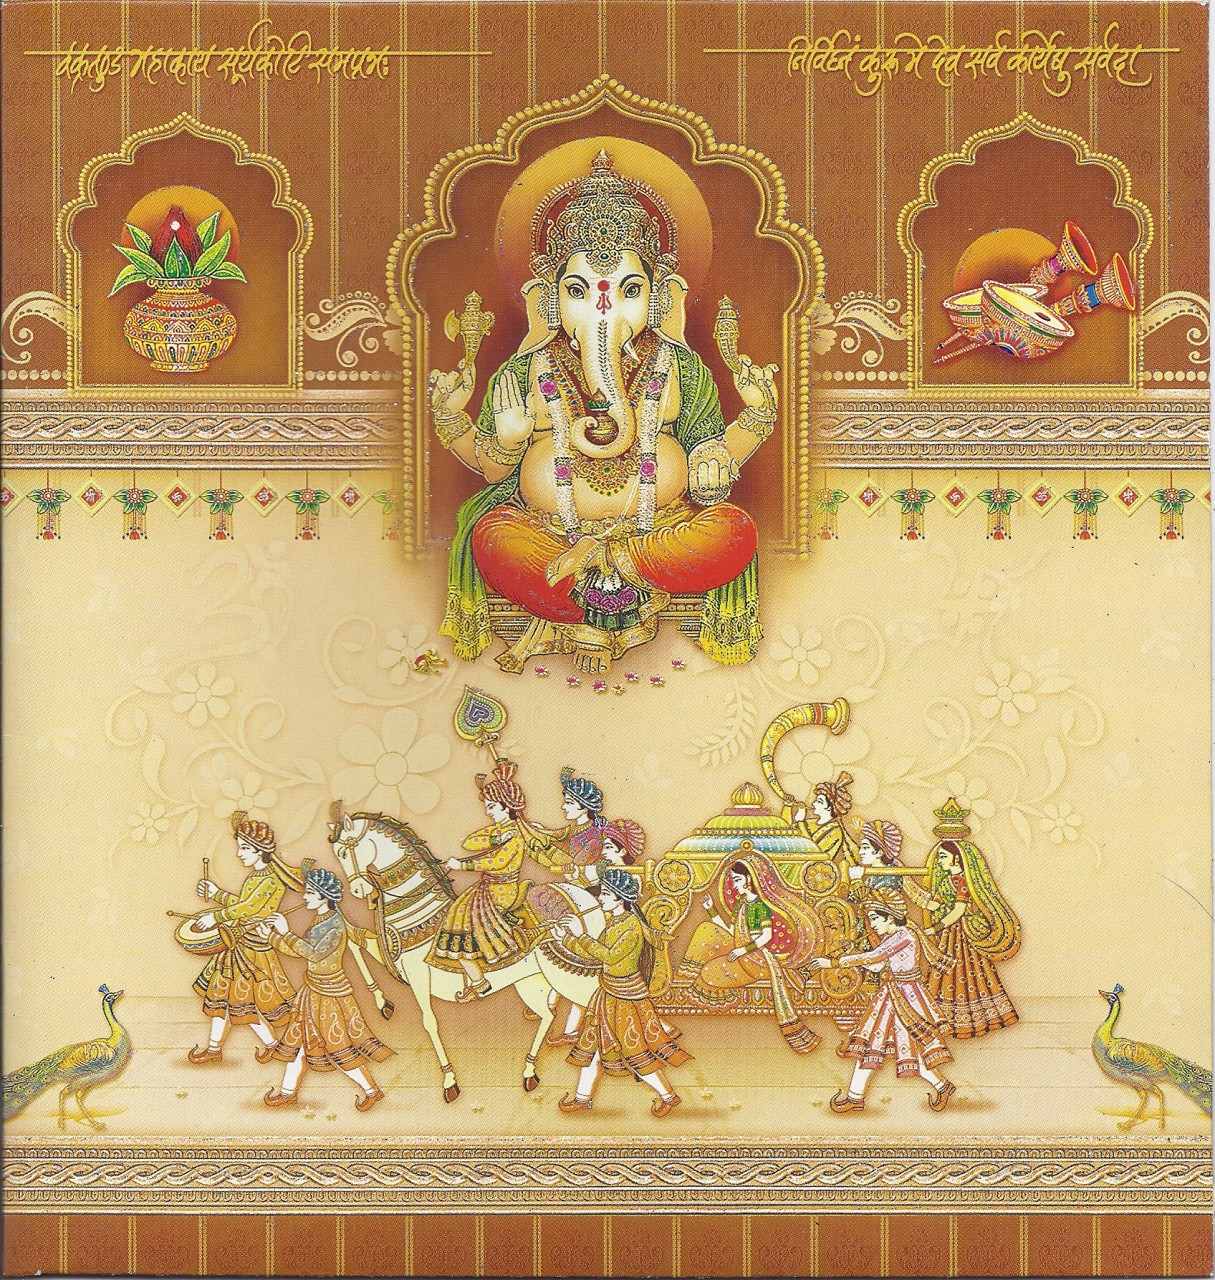 Ganesh Wedding Invitations: Cheap Wedding Invites: Ganesha Wedding Invitations